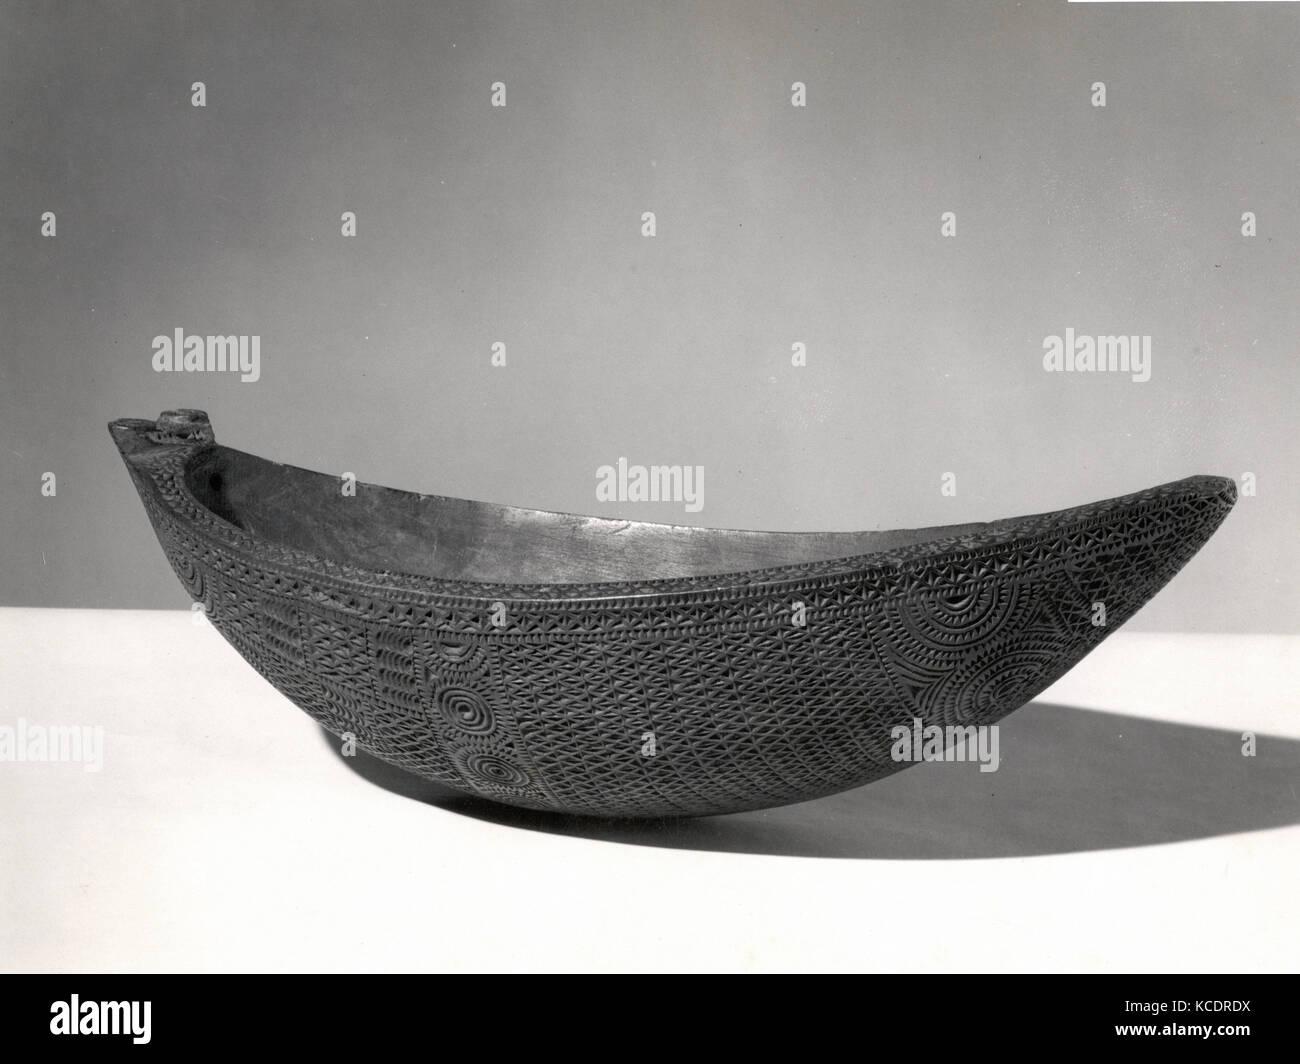 Bowl, ca. 1820–40, French Polynesia, Austral Islands, Austral Islanders, Wood, H. 4 5/16 x W. 6 1/2 x D. 13 1/8 - Stock Image